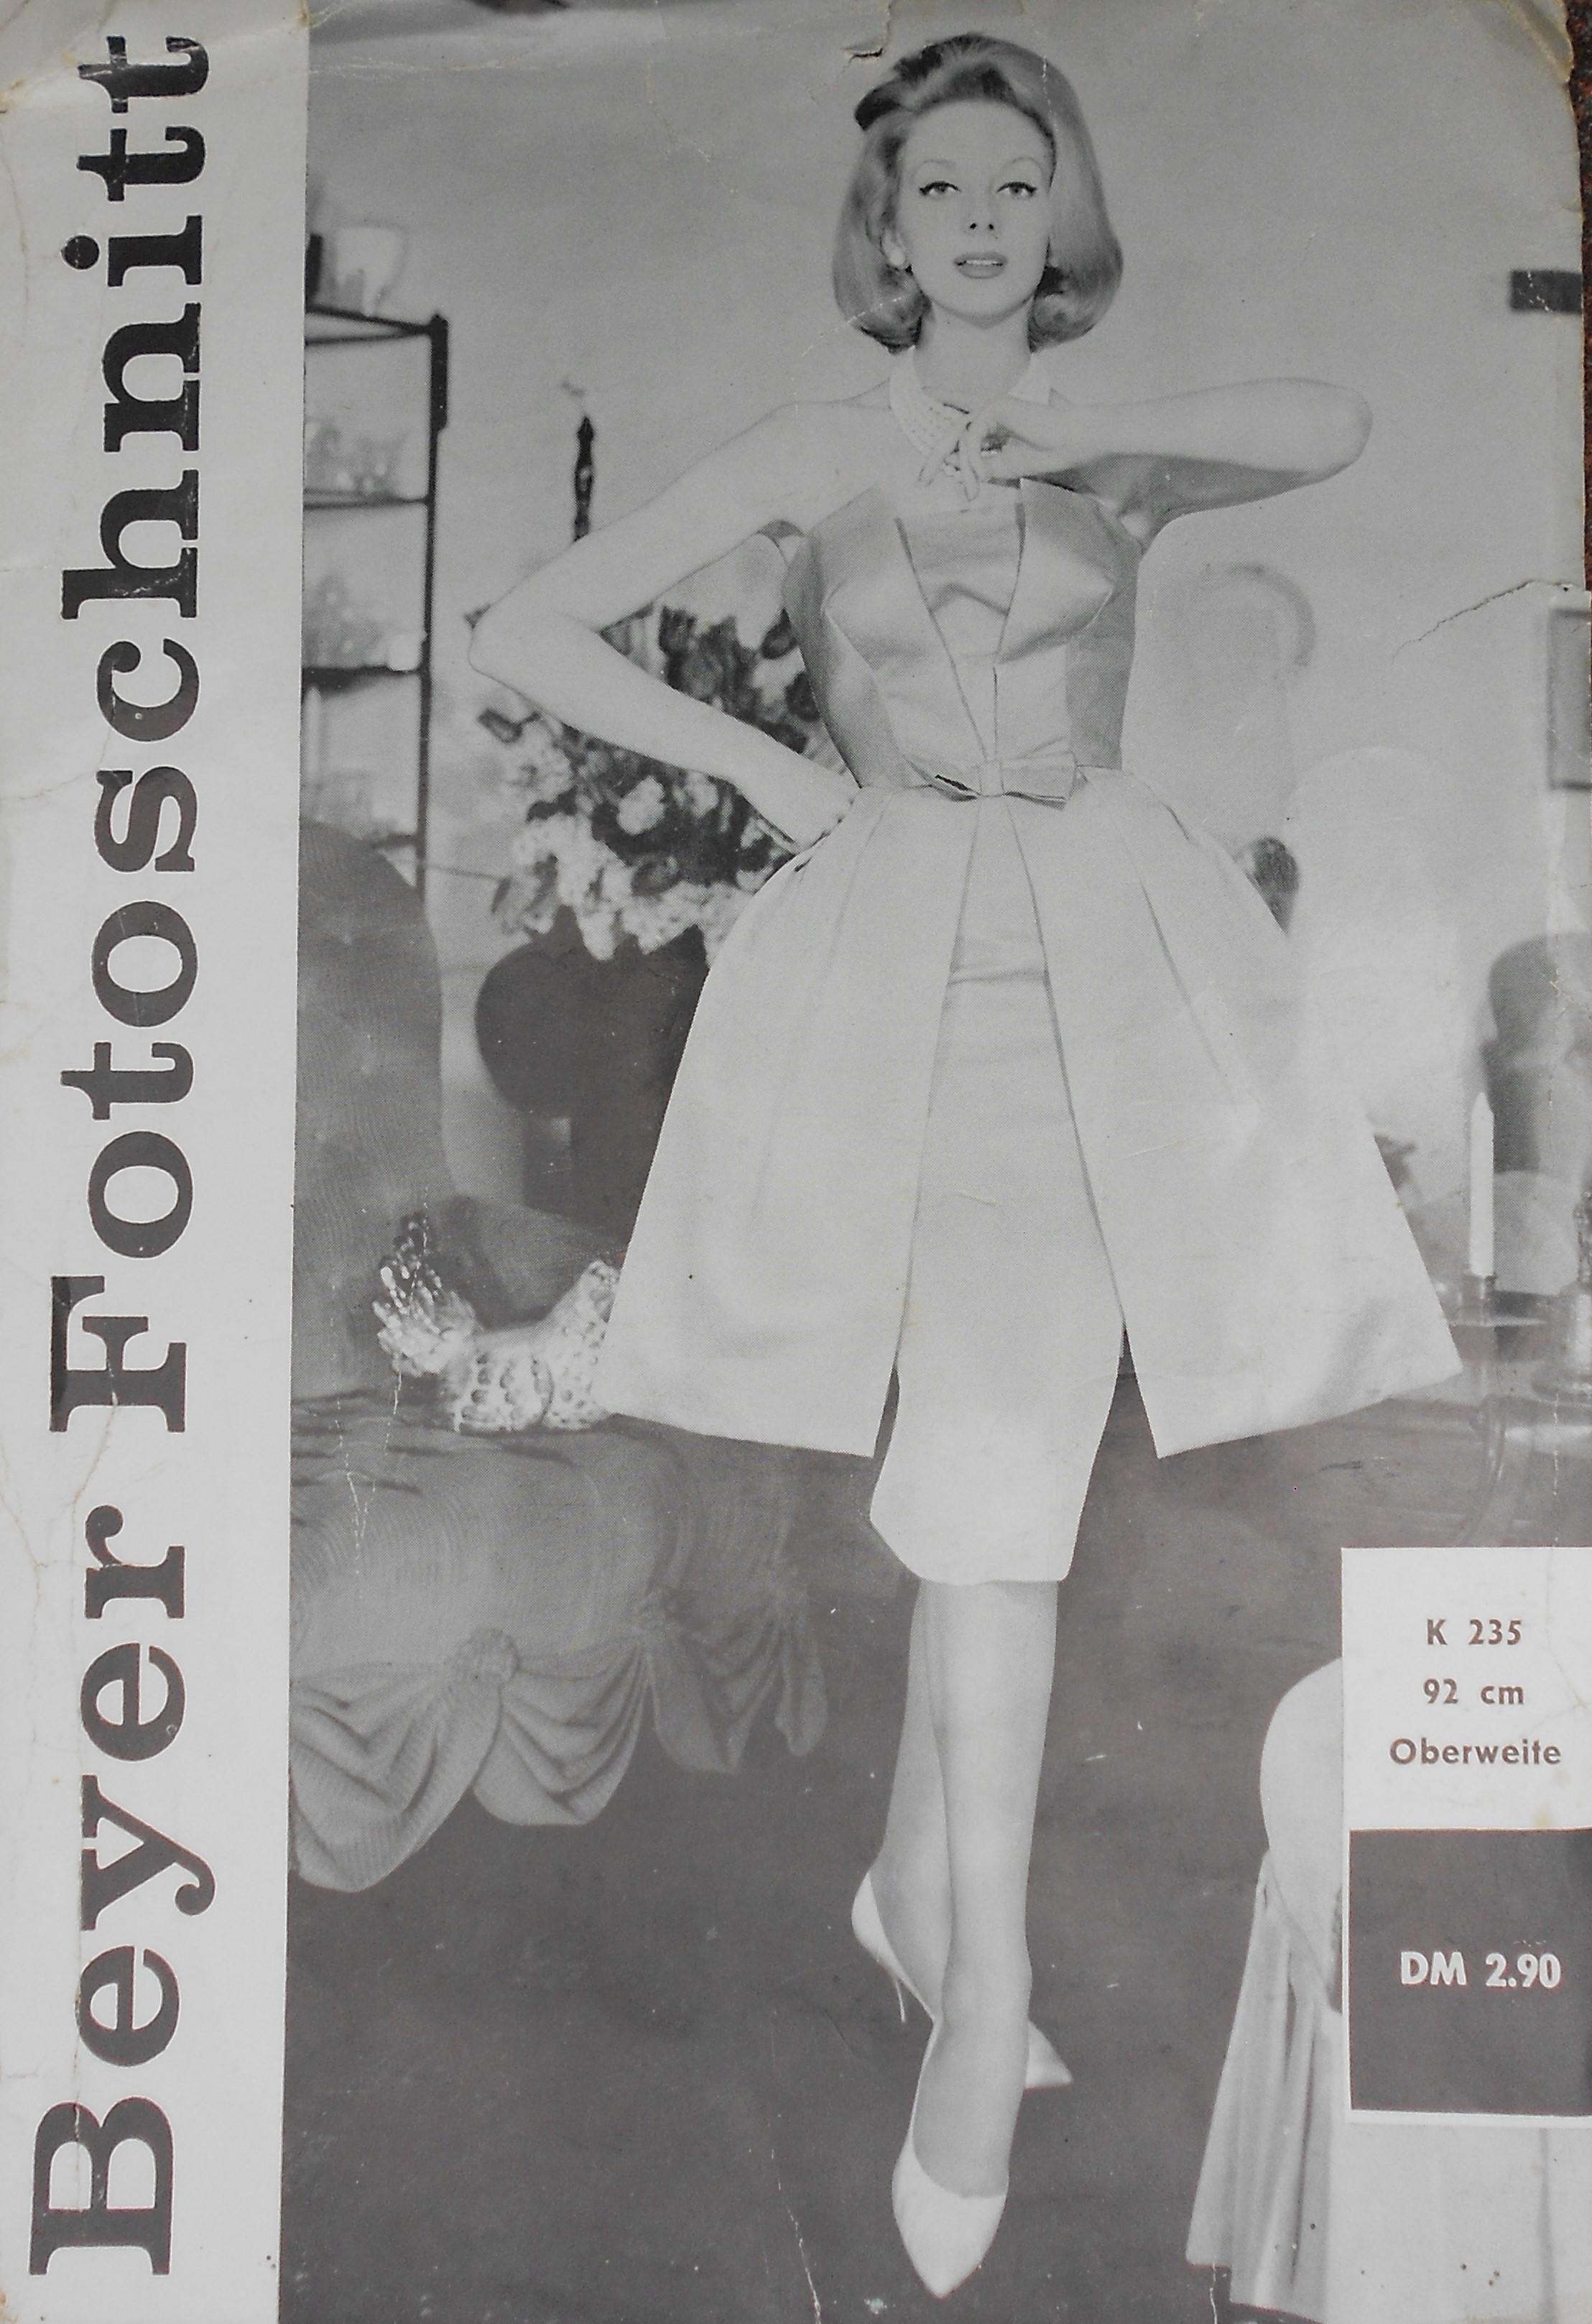 Beyer Fotoschnitt K235